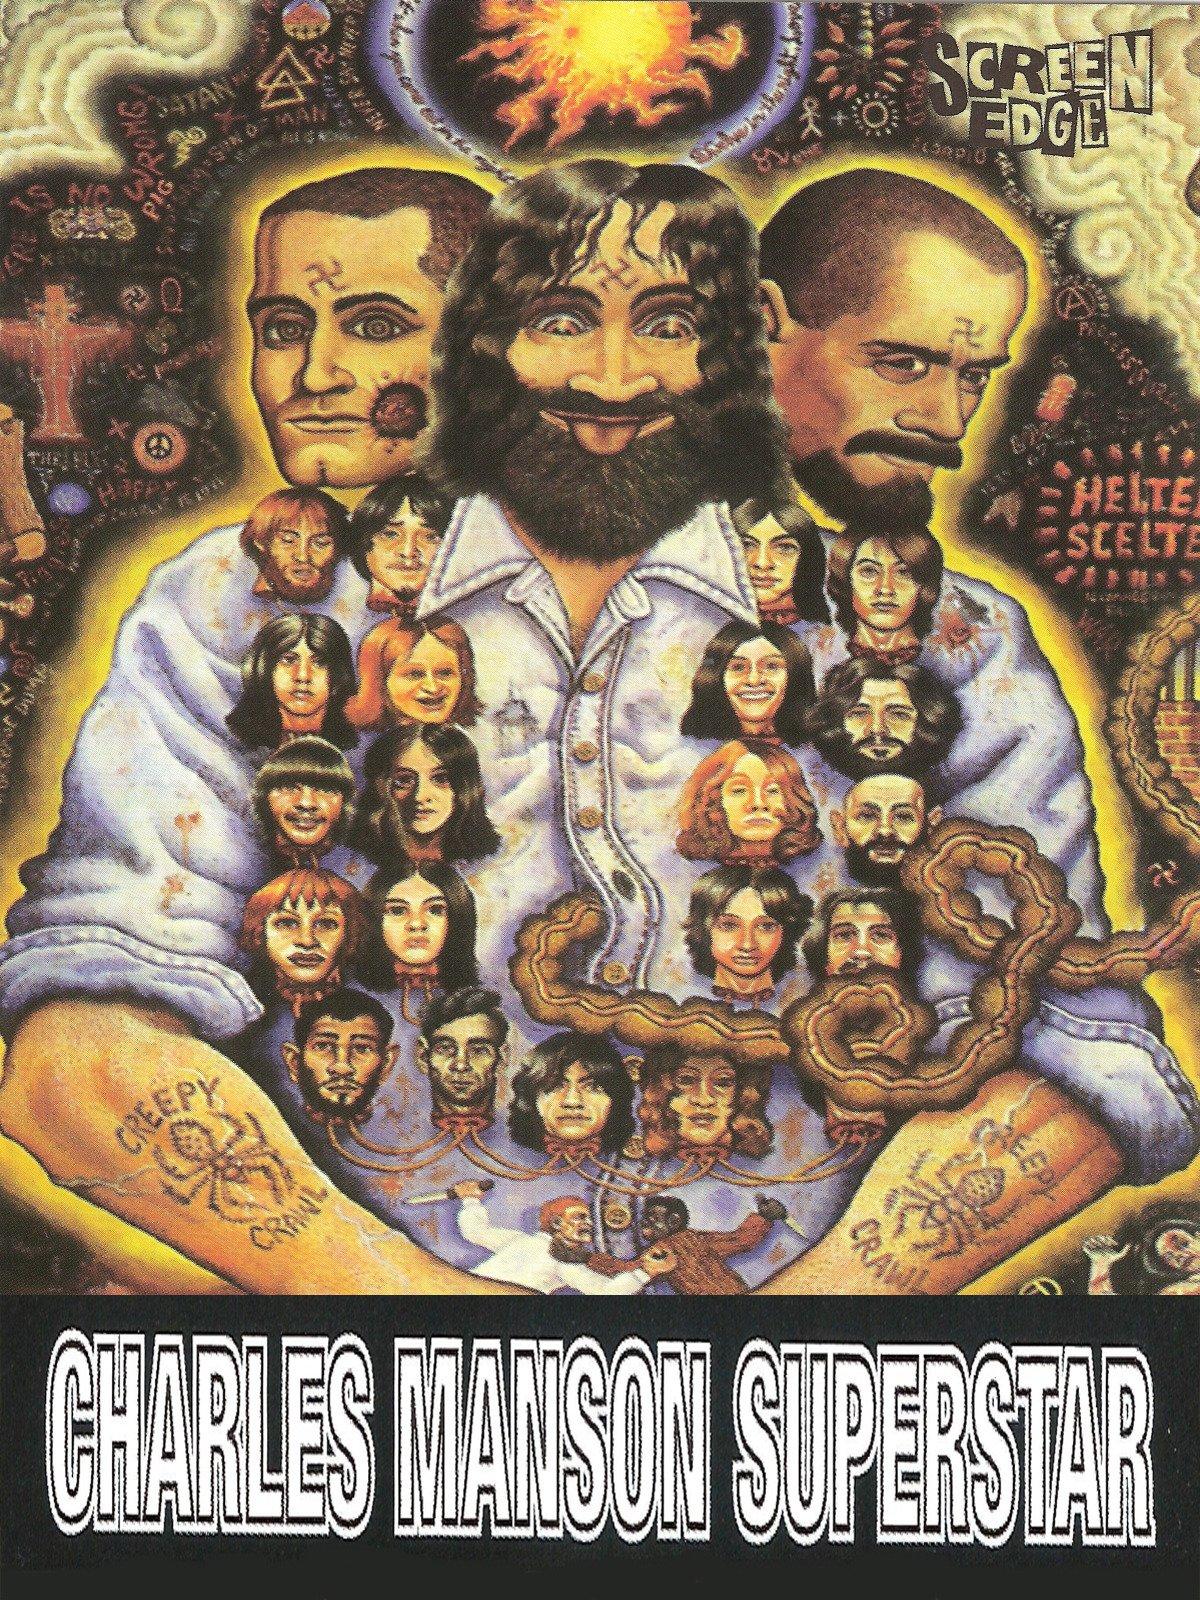 Charles Manson - Superstar on Amazon Prime Video UK